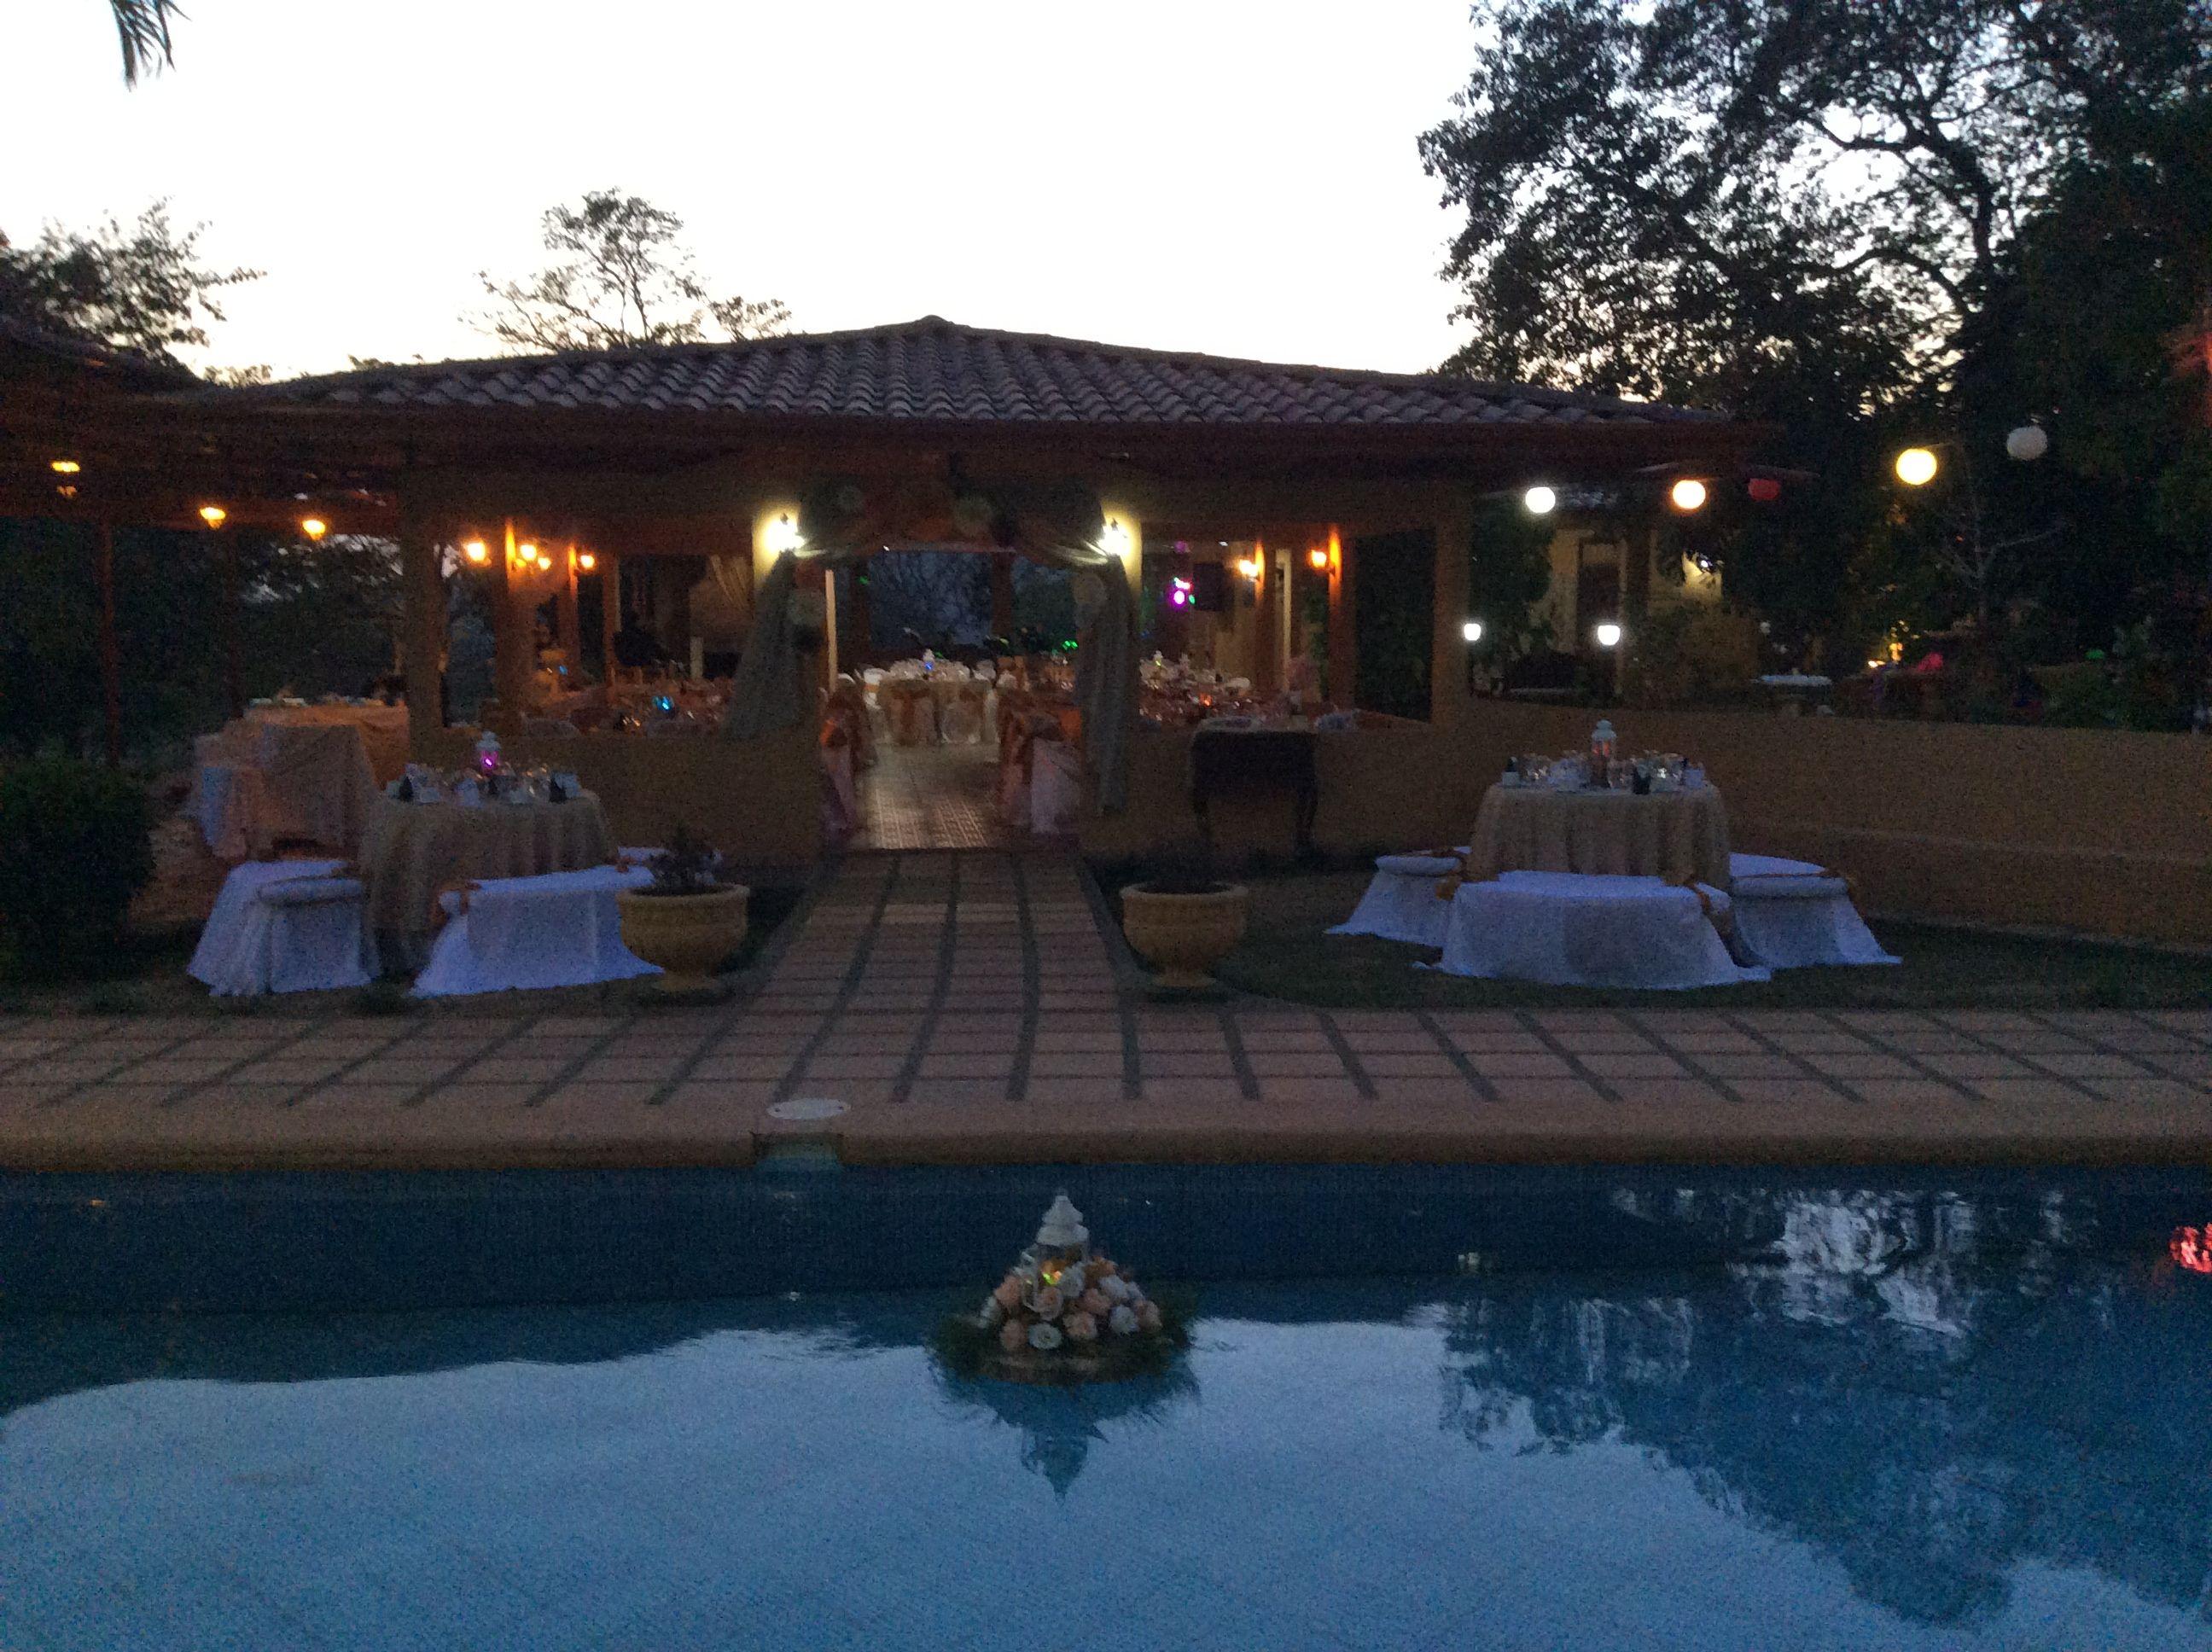 wedding pool   Pool wedding, Outdoor decor, Pool